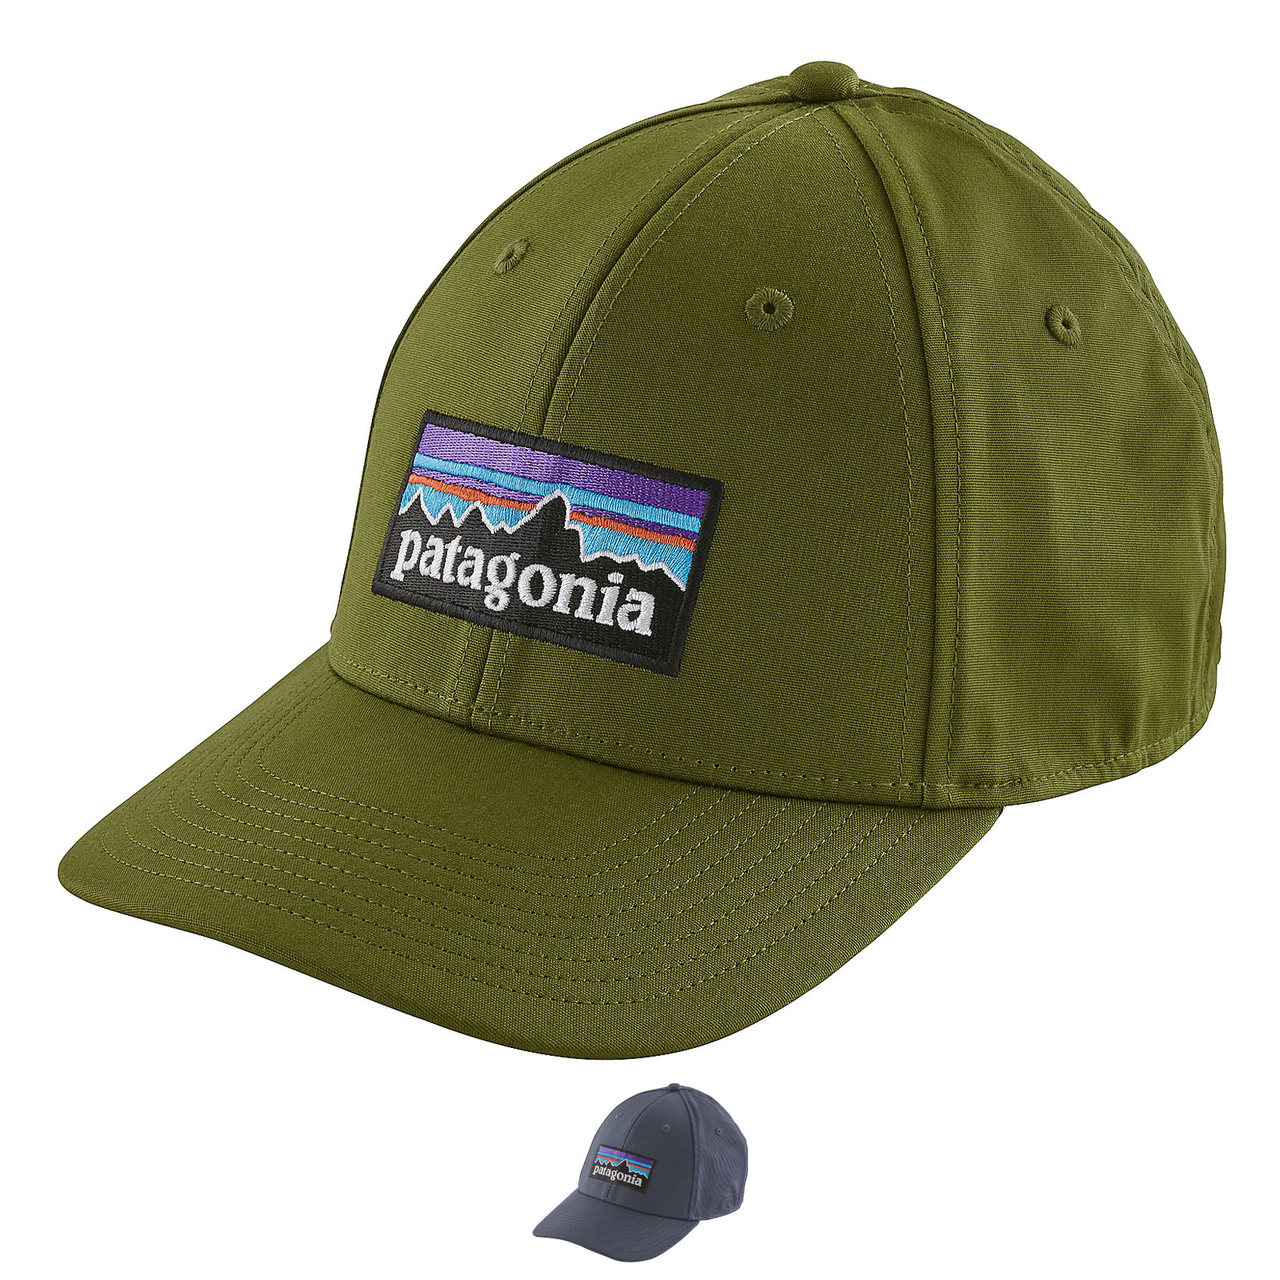 779e7f8d0e070 Patagonia P-6 Logo Stretch Fit Hat - AvidMax